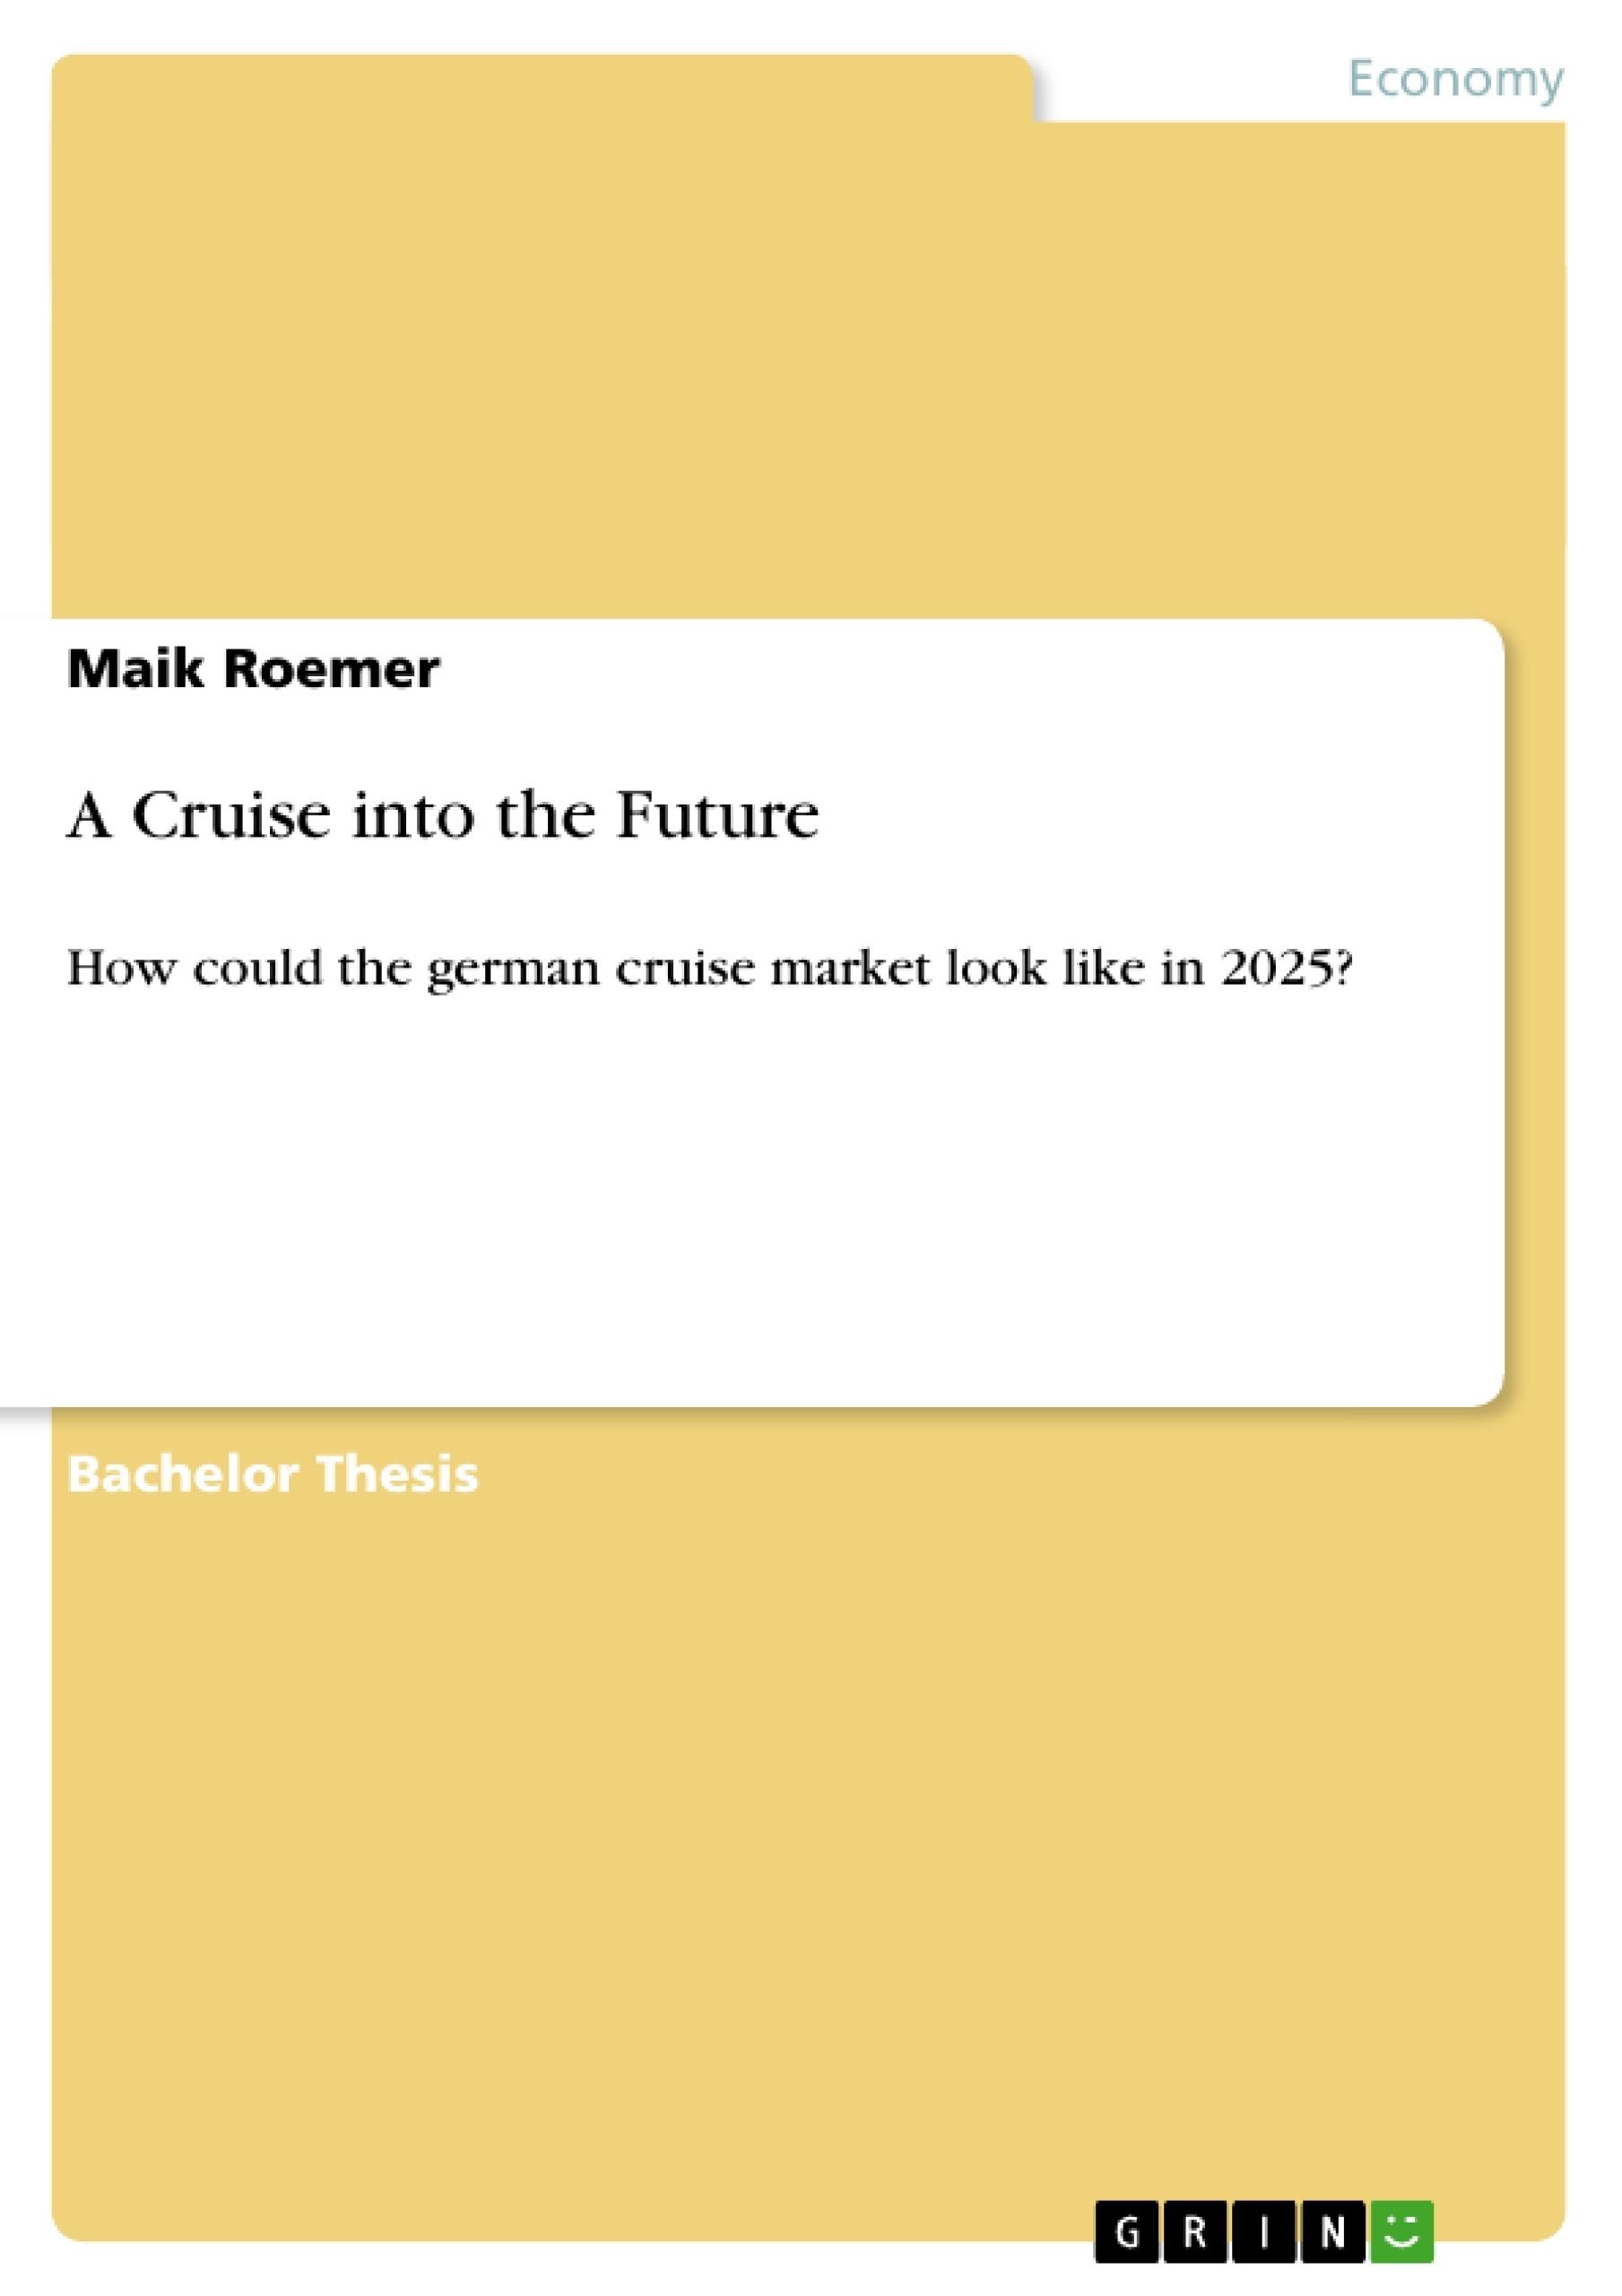 Title: A Cruise into the Future